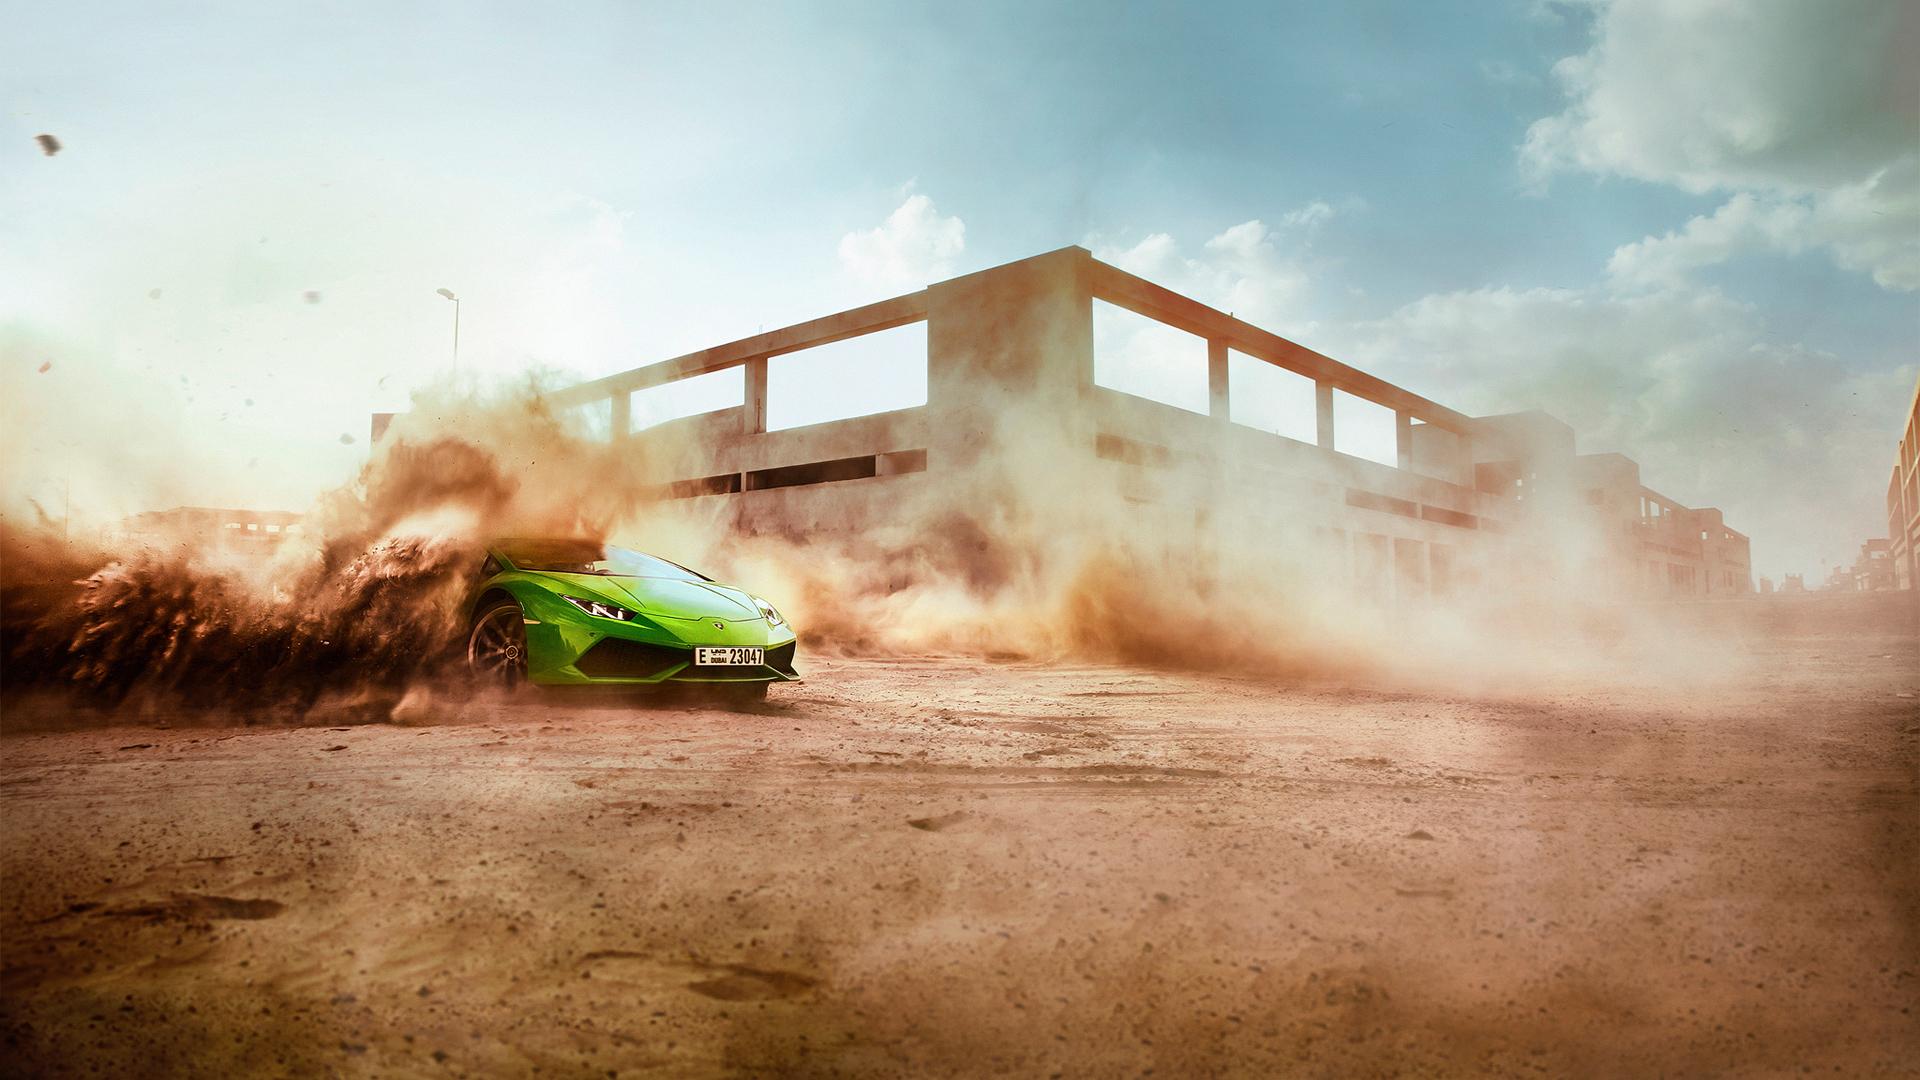 Картинка: Lamborghini, суперкар, пыль, скорость, здания, дрифт